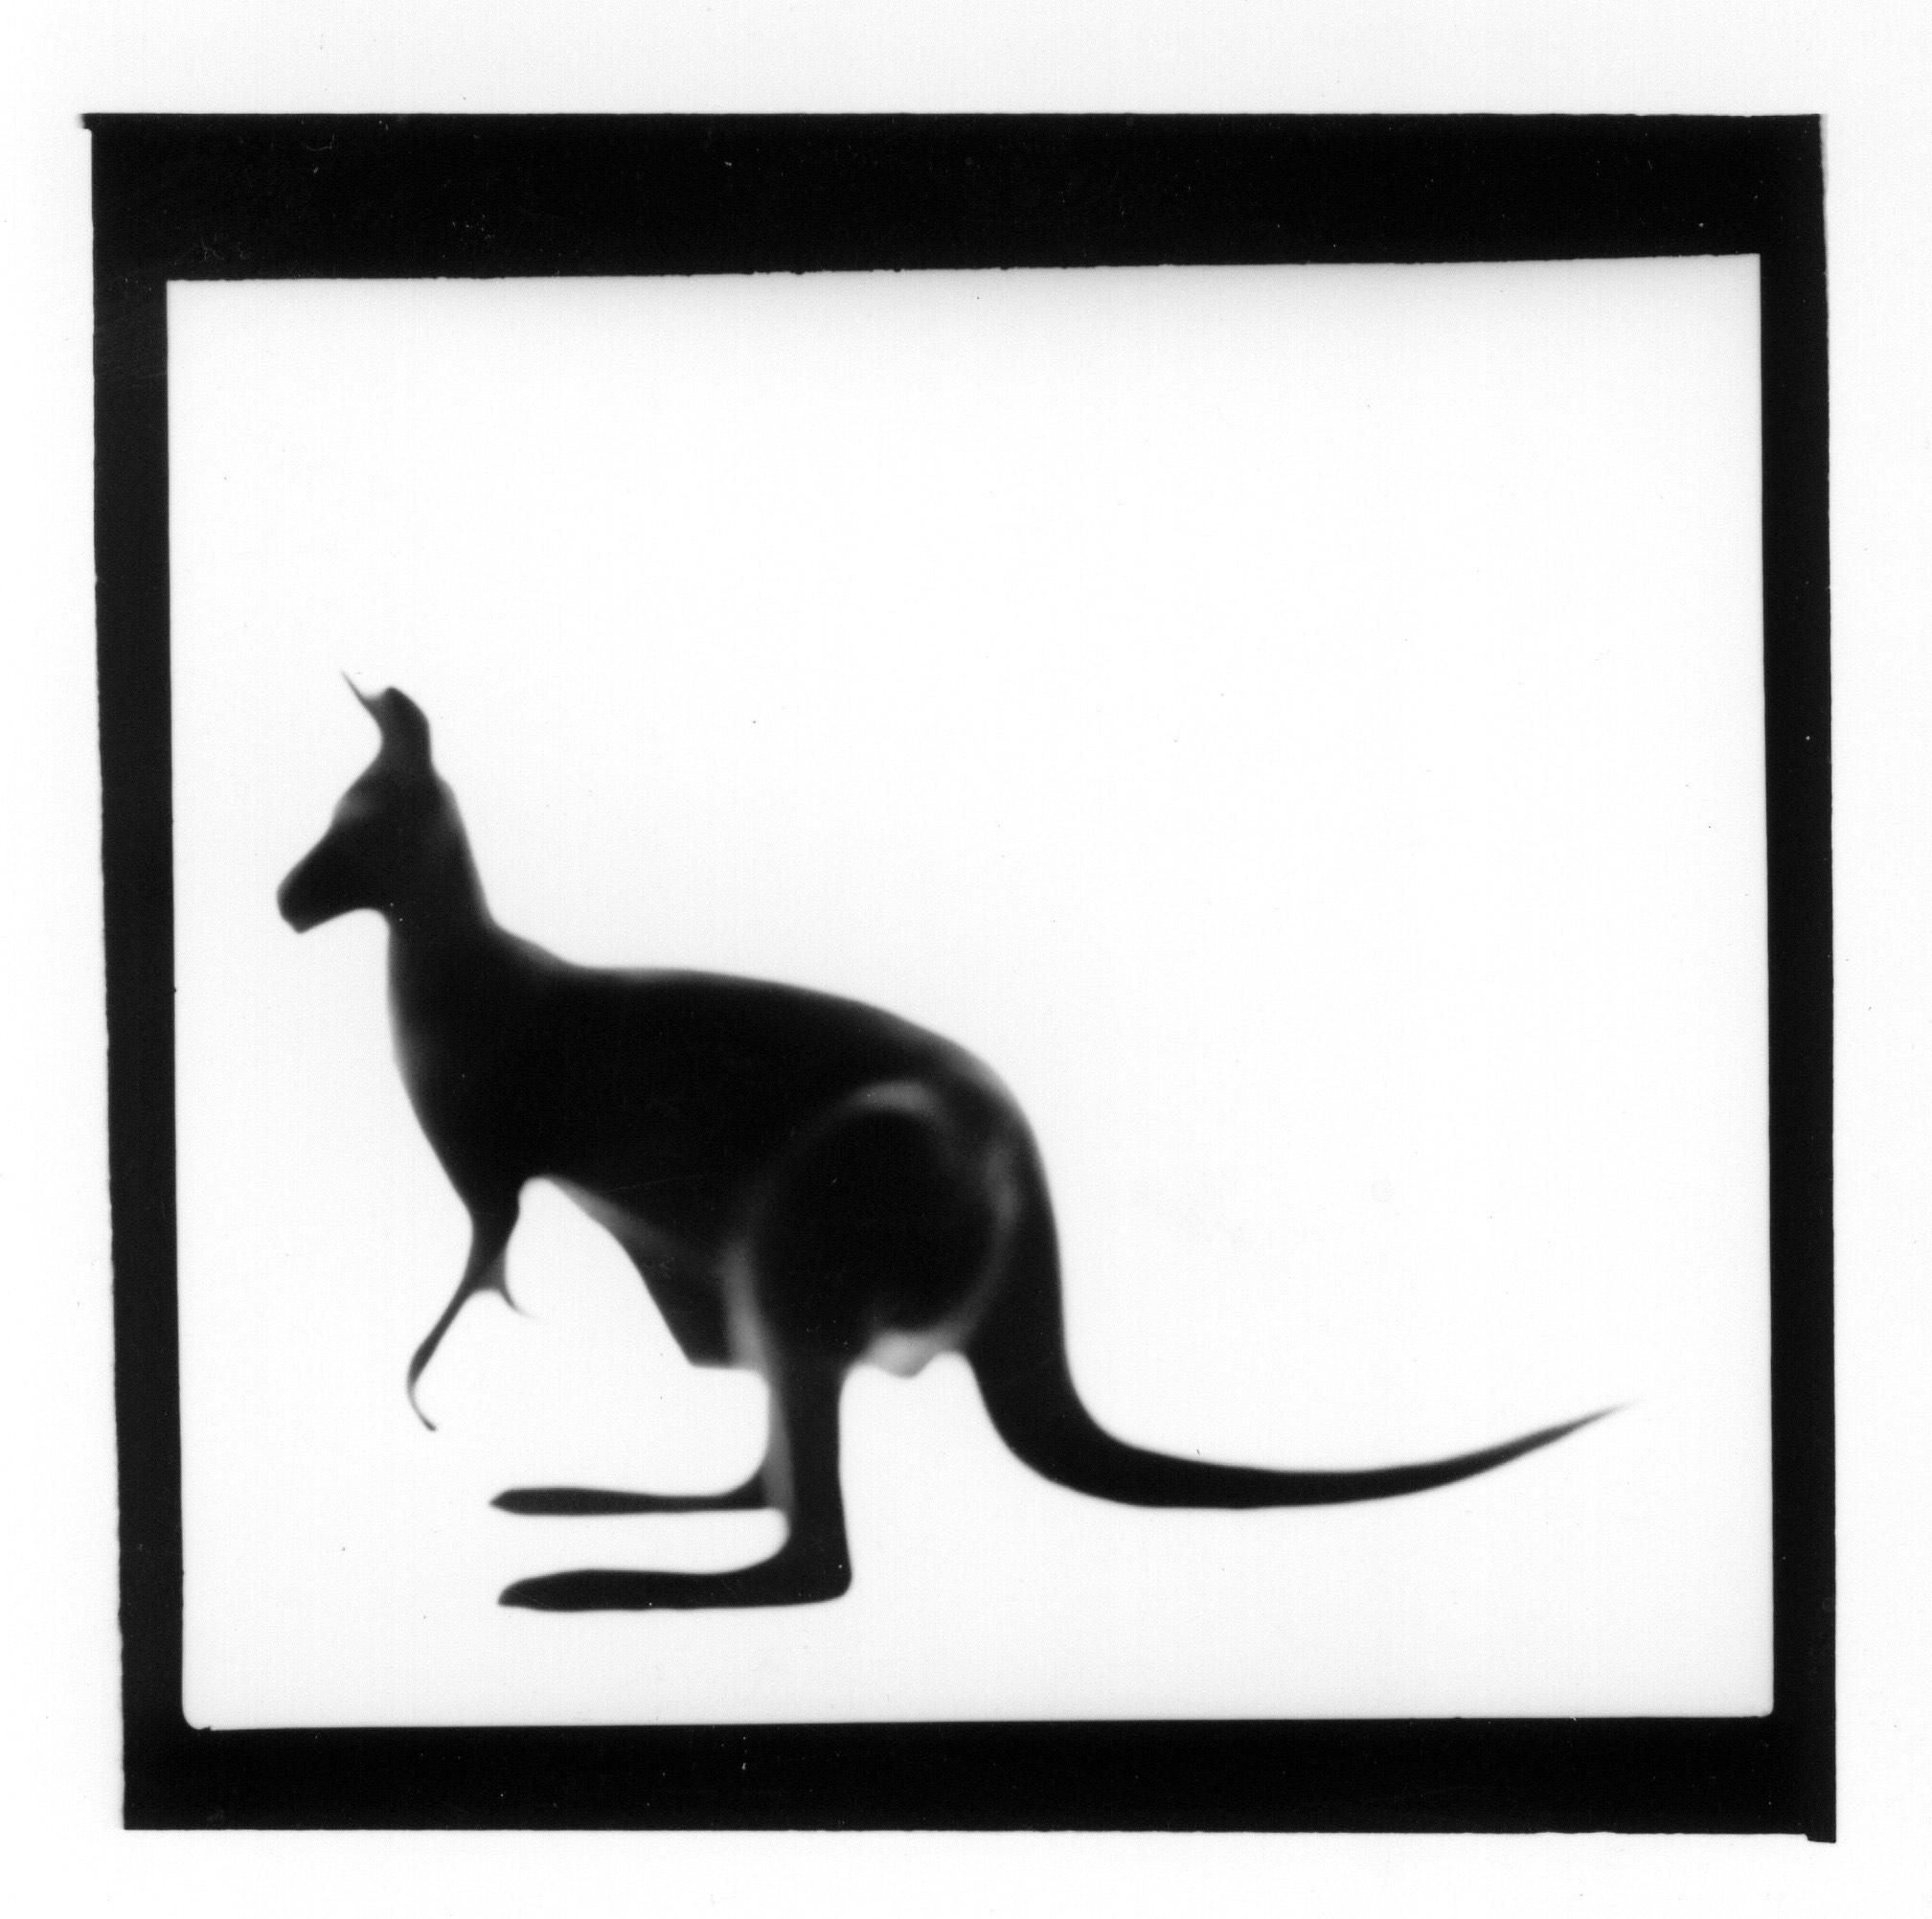 Kangaroo from The Animal Series, 2000